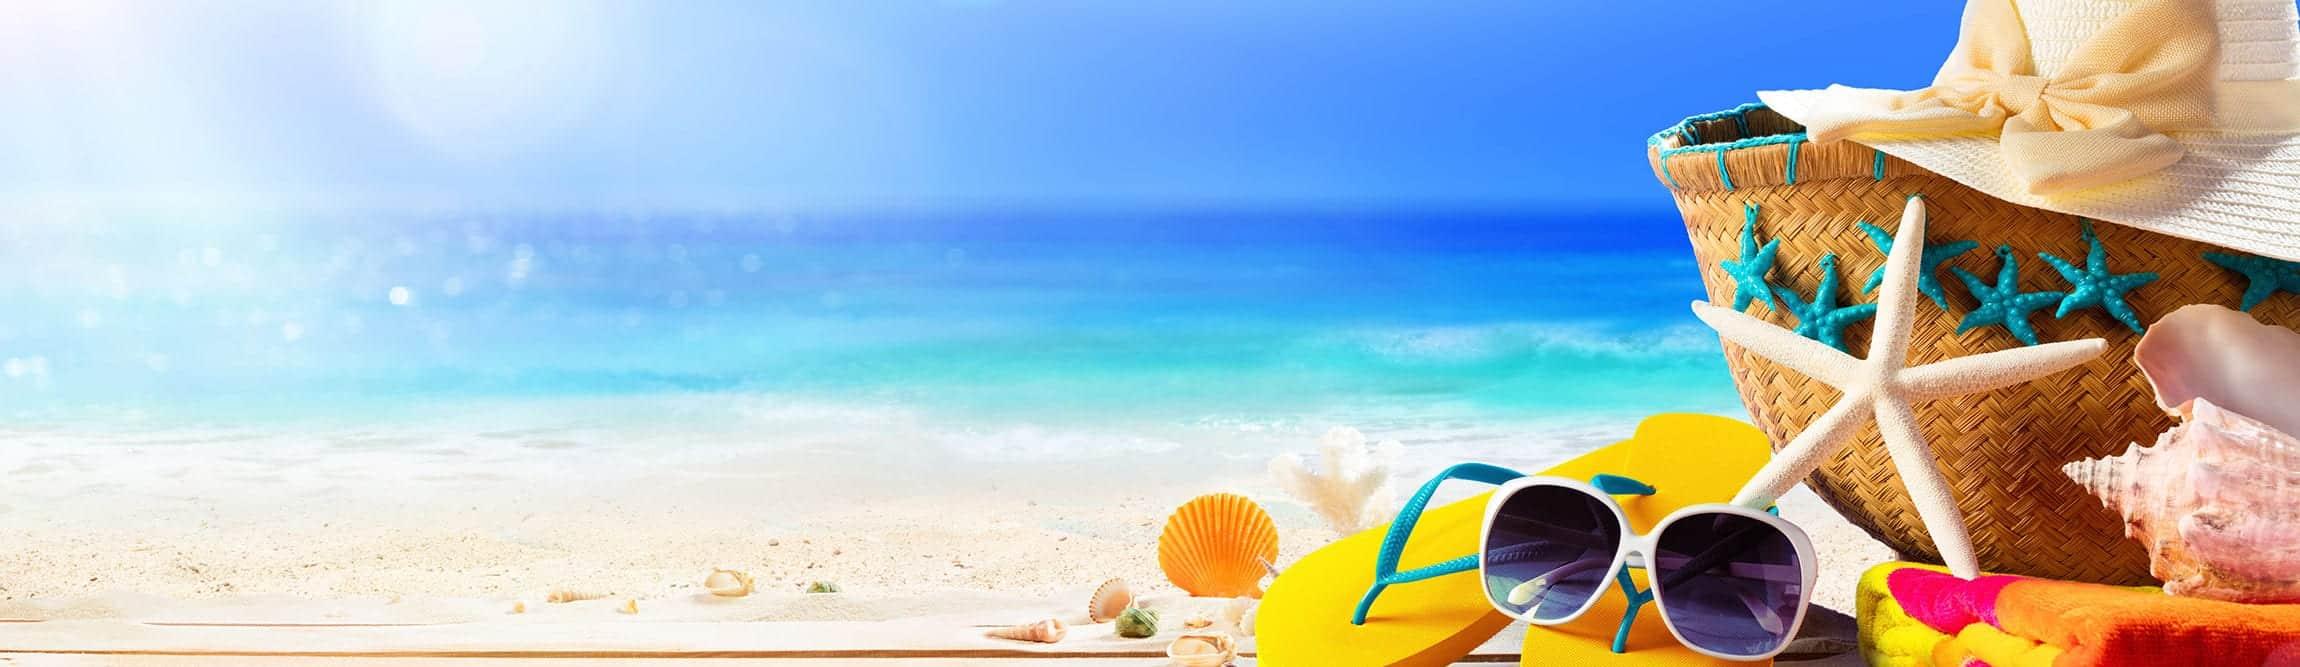 Holiday-sunhat-flip-flops-sunglasses-banner